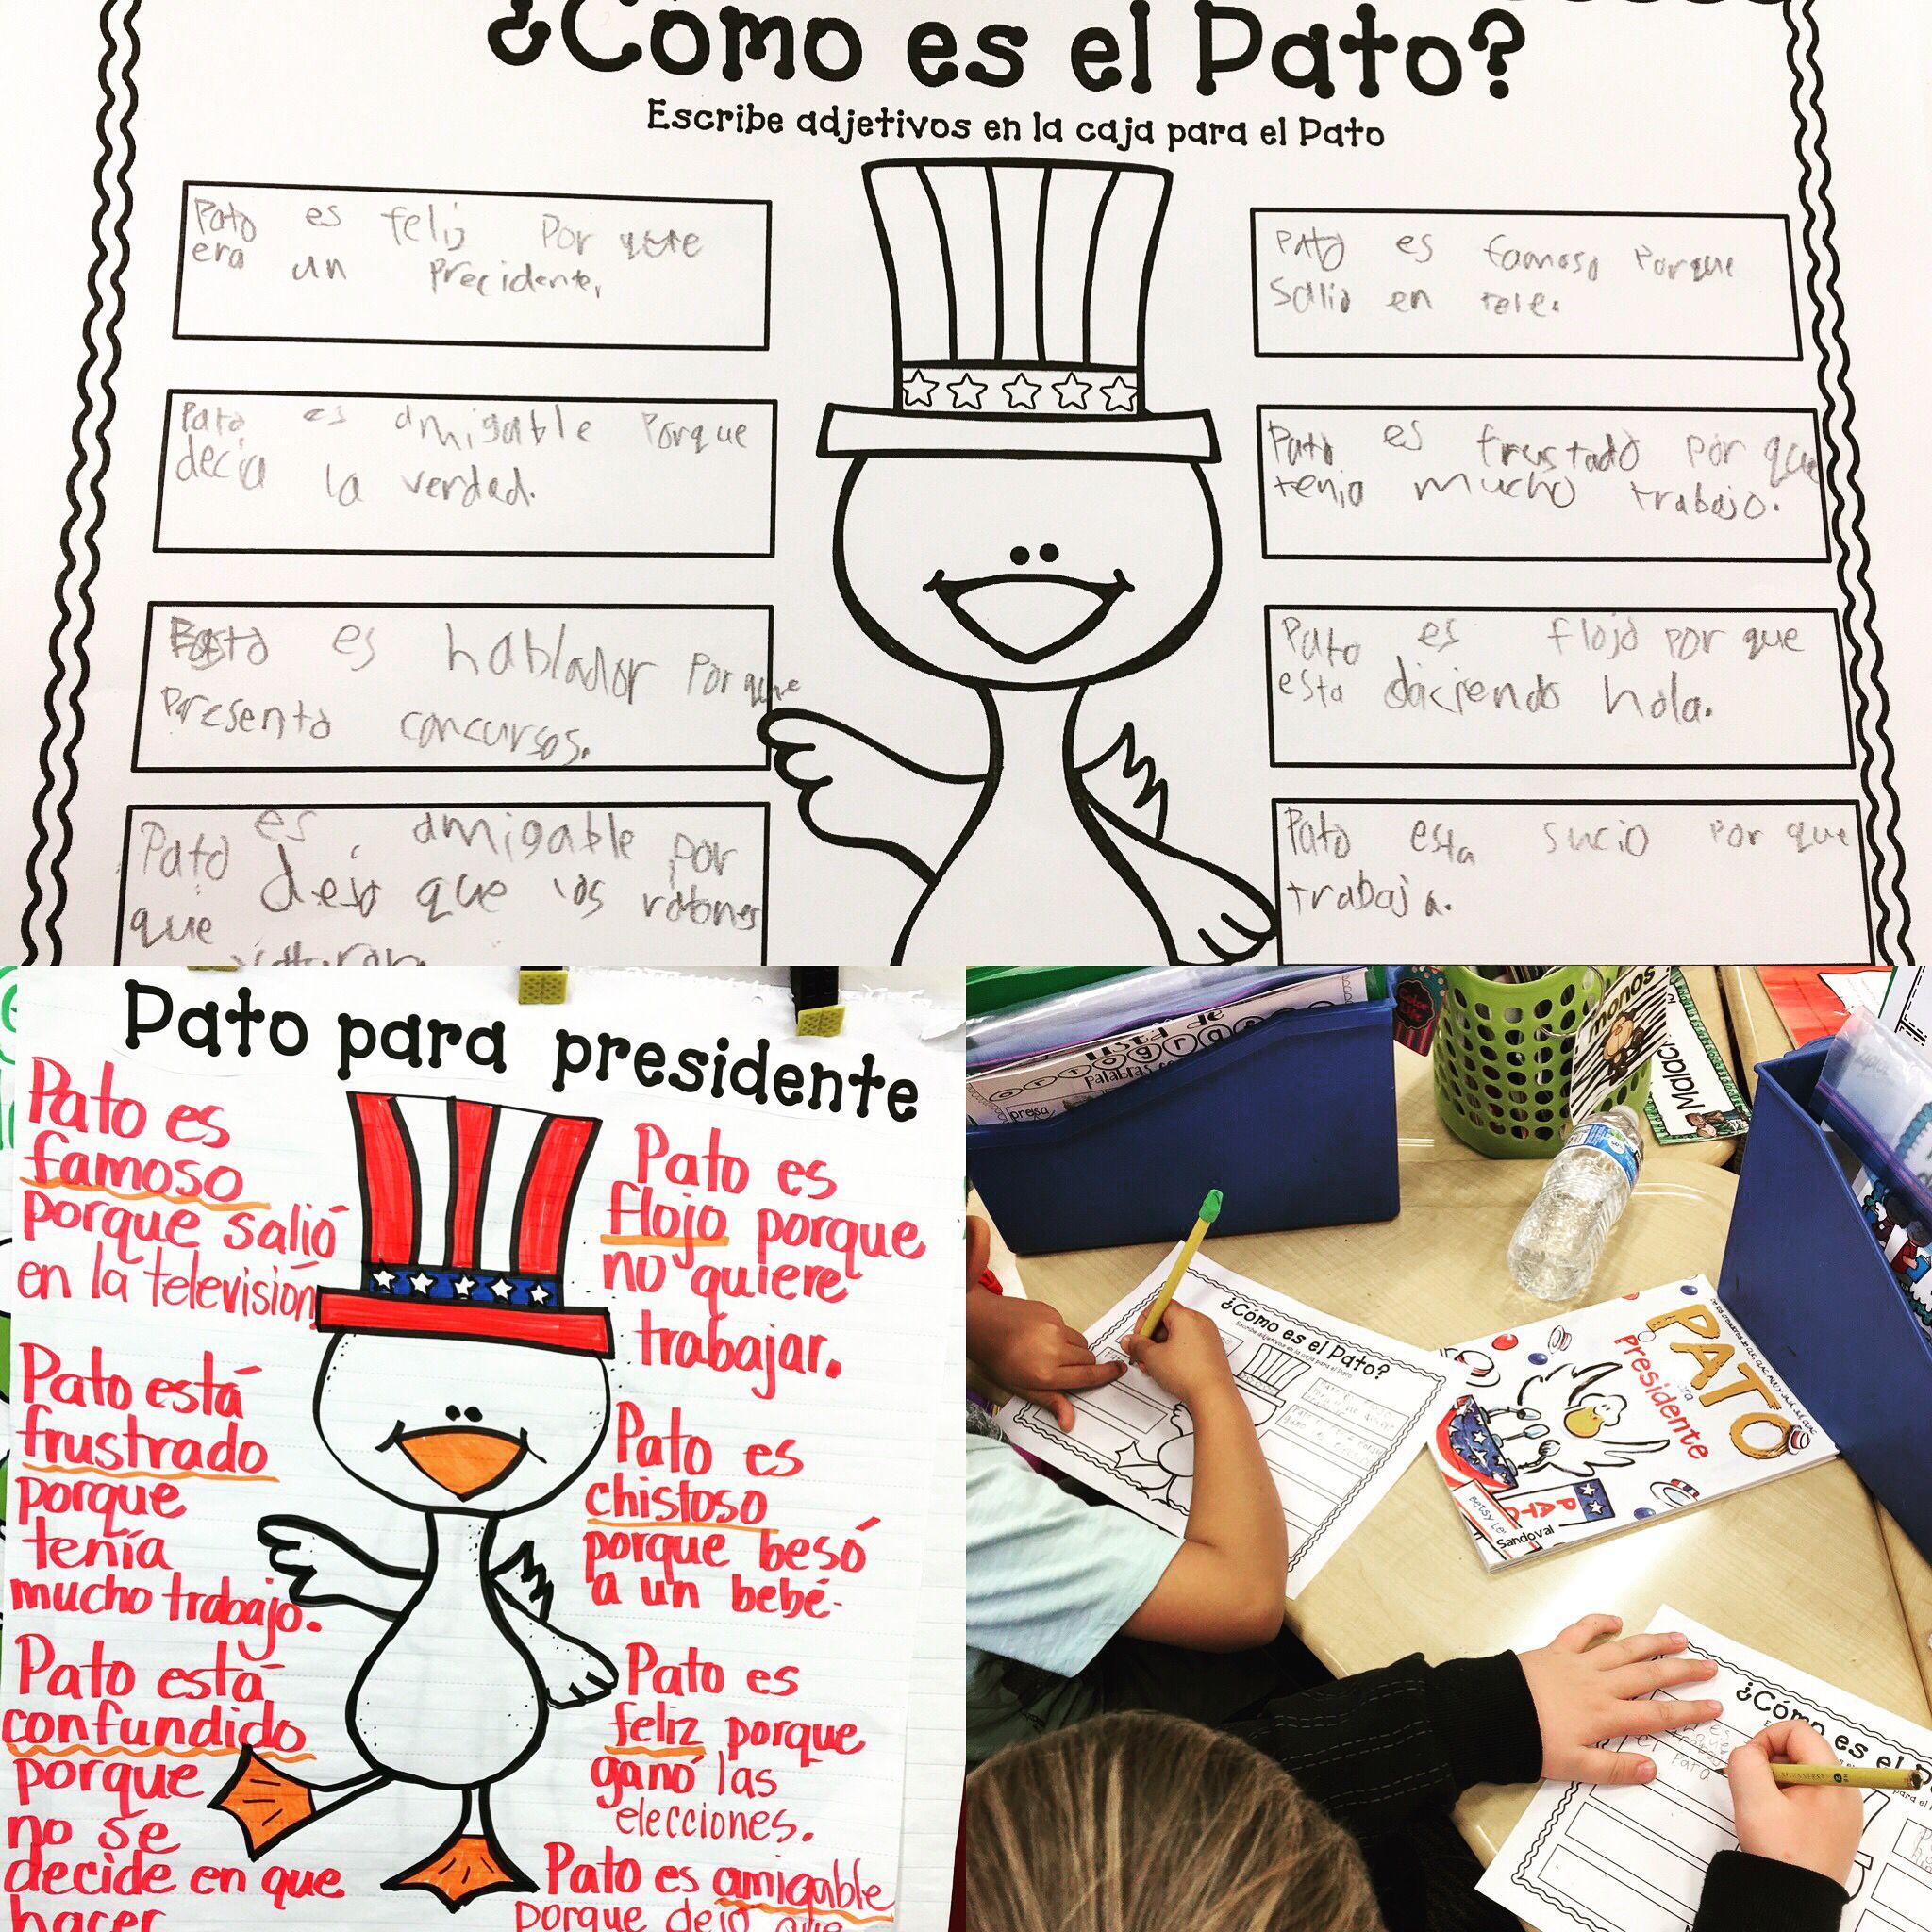 Pato para presidente | Cole | Pinterest | Patos, Presidentes y Lenguaje